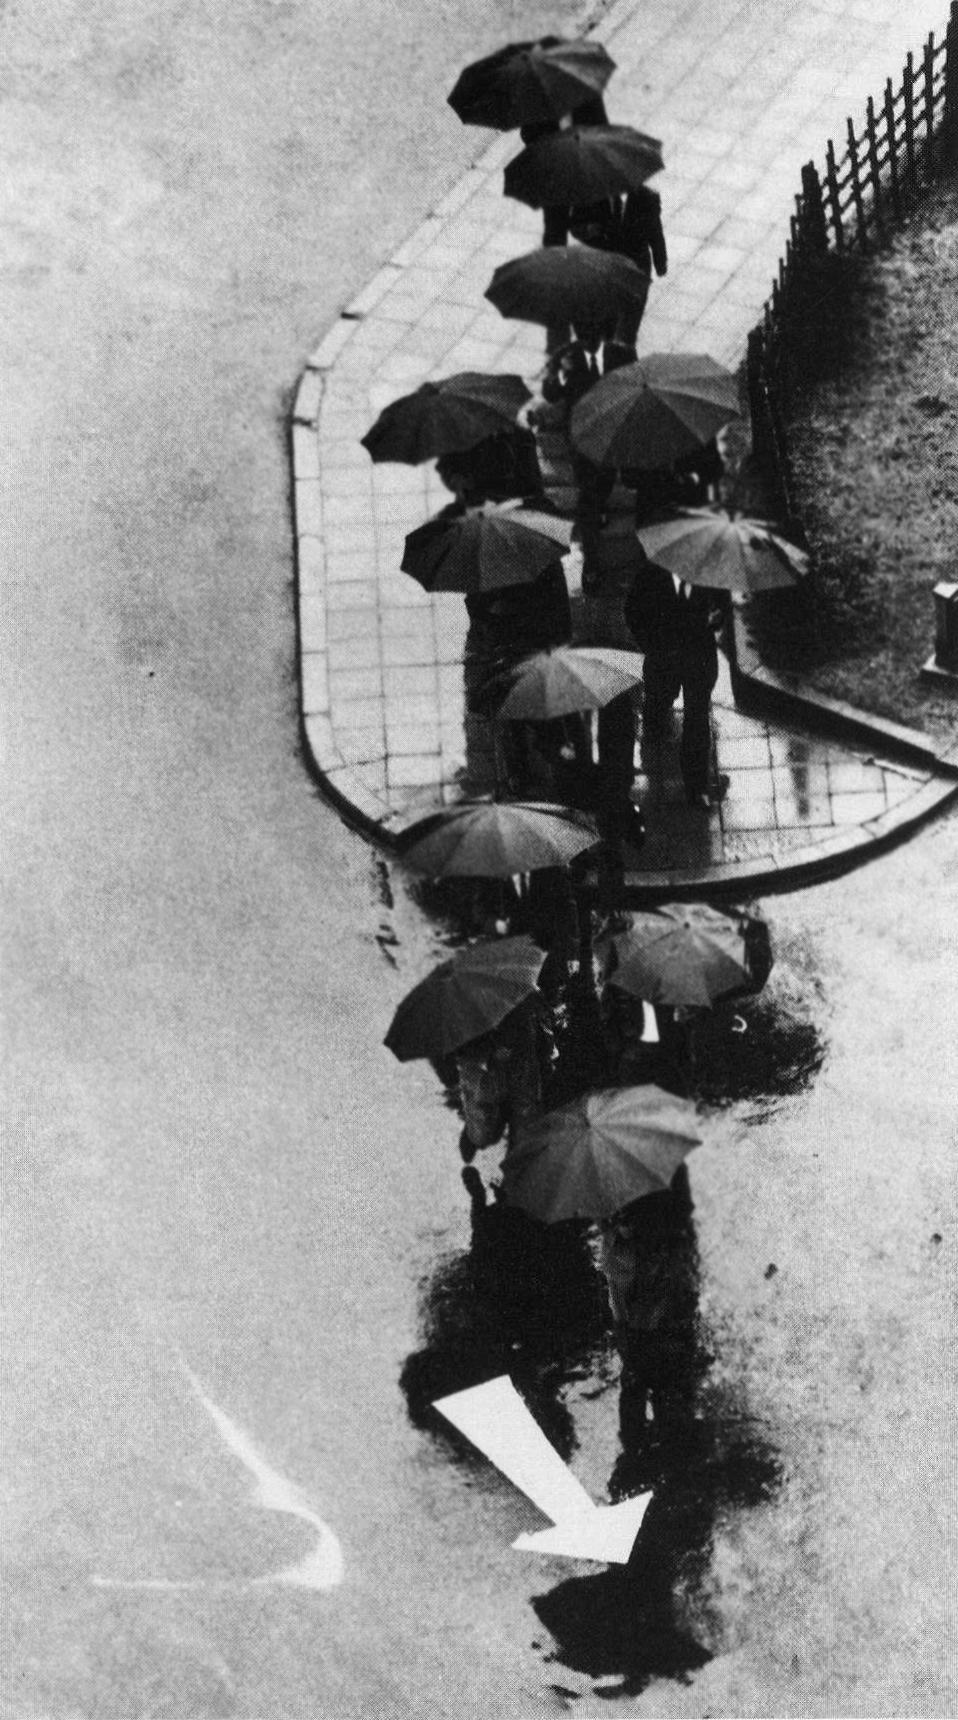 kert1968.png